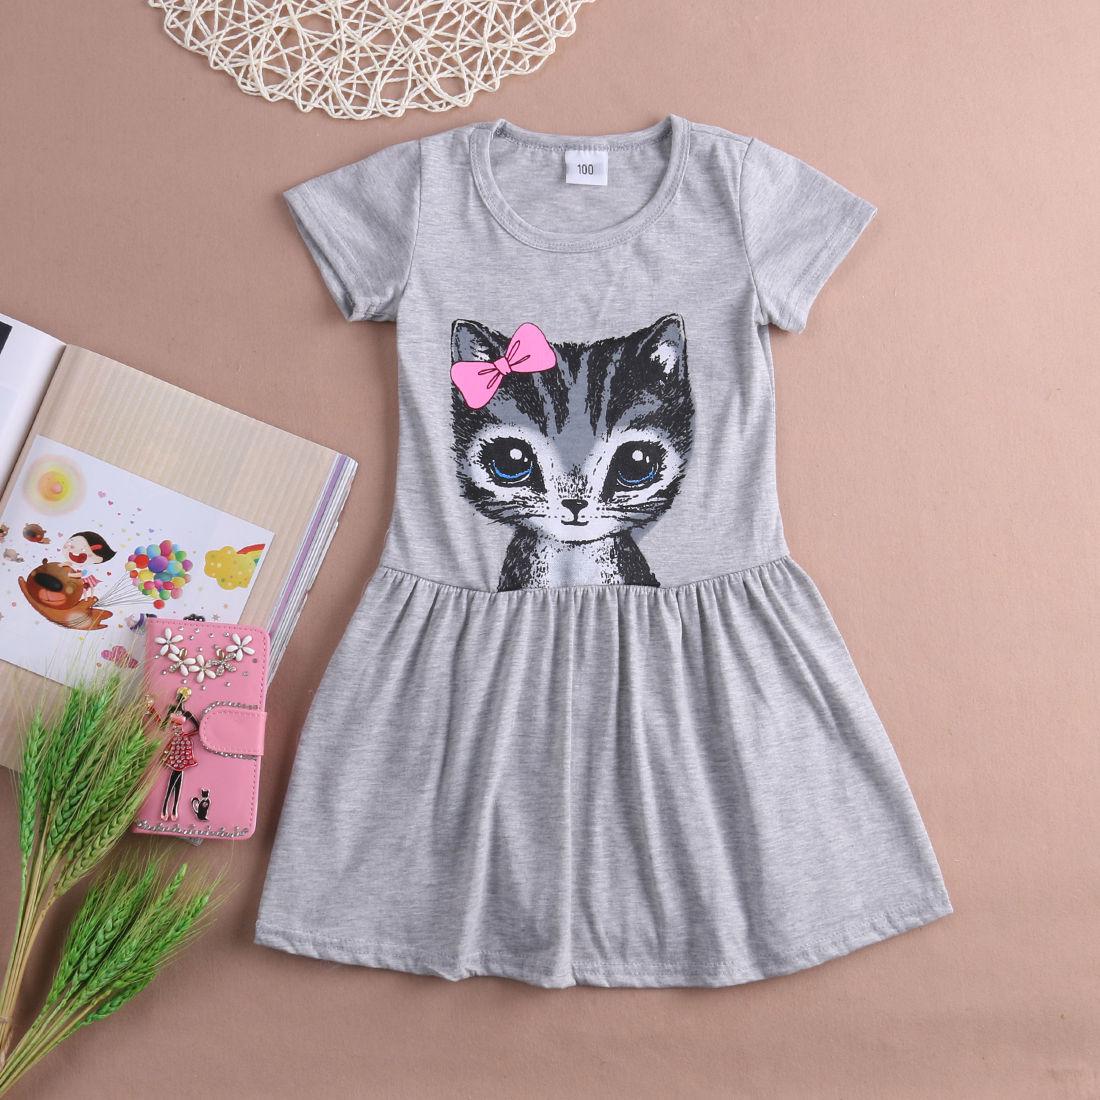 2-8 Year Kids Baby Girl Clothes Print Cartoon Cat Kitty Princess Dresses Little Girls Tutu Party Wedding Summer Dress